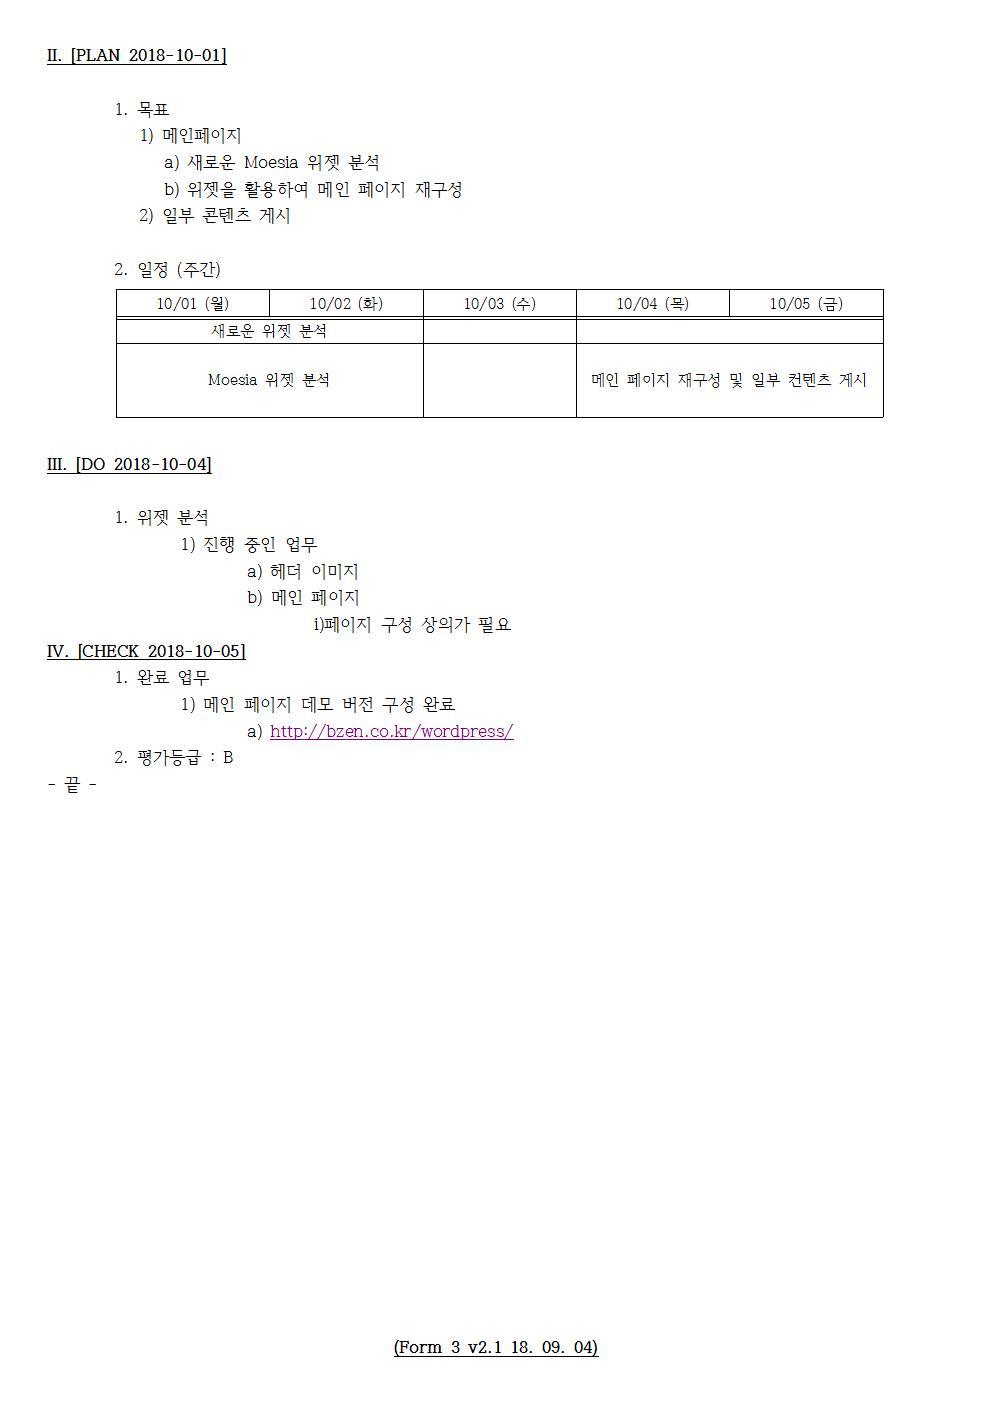 D-[18-047-BZ-07]-[BZEN HP v3.0]-[2018-10-05][HH]002.jpg